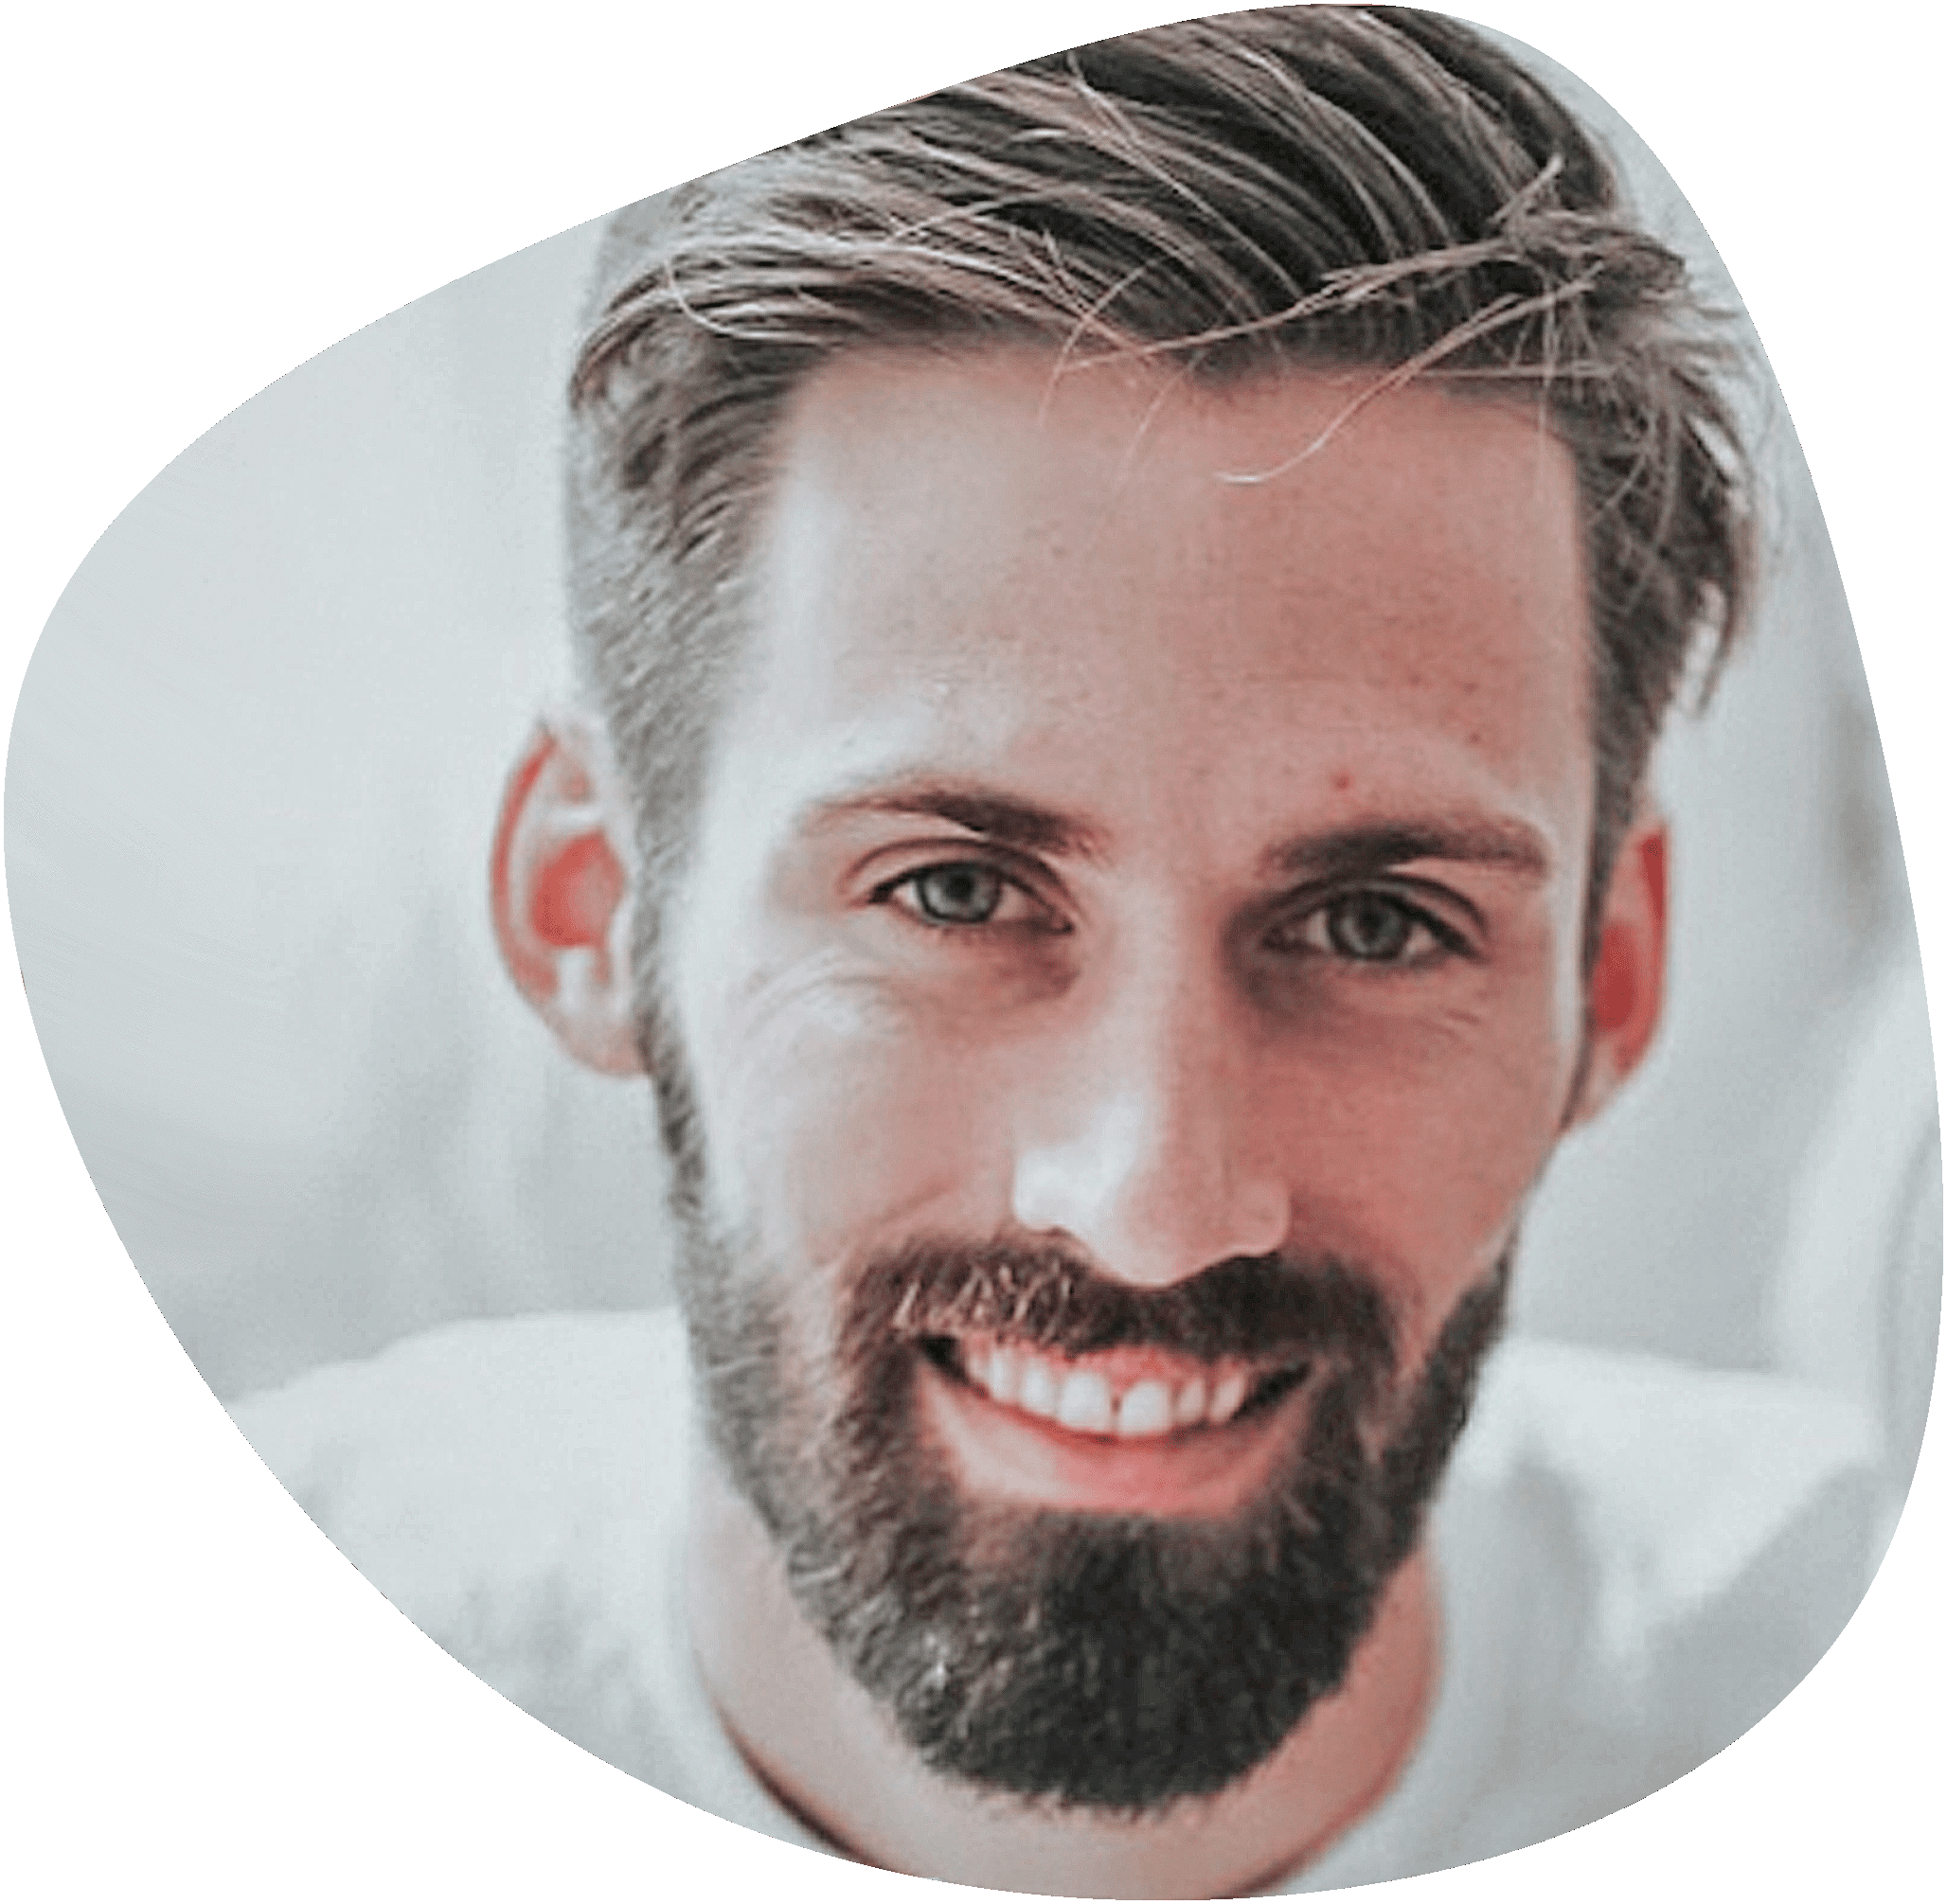 Caleb-testimonial